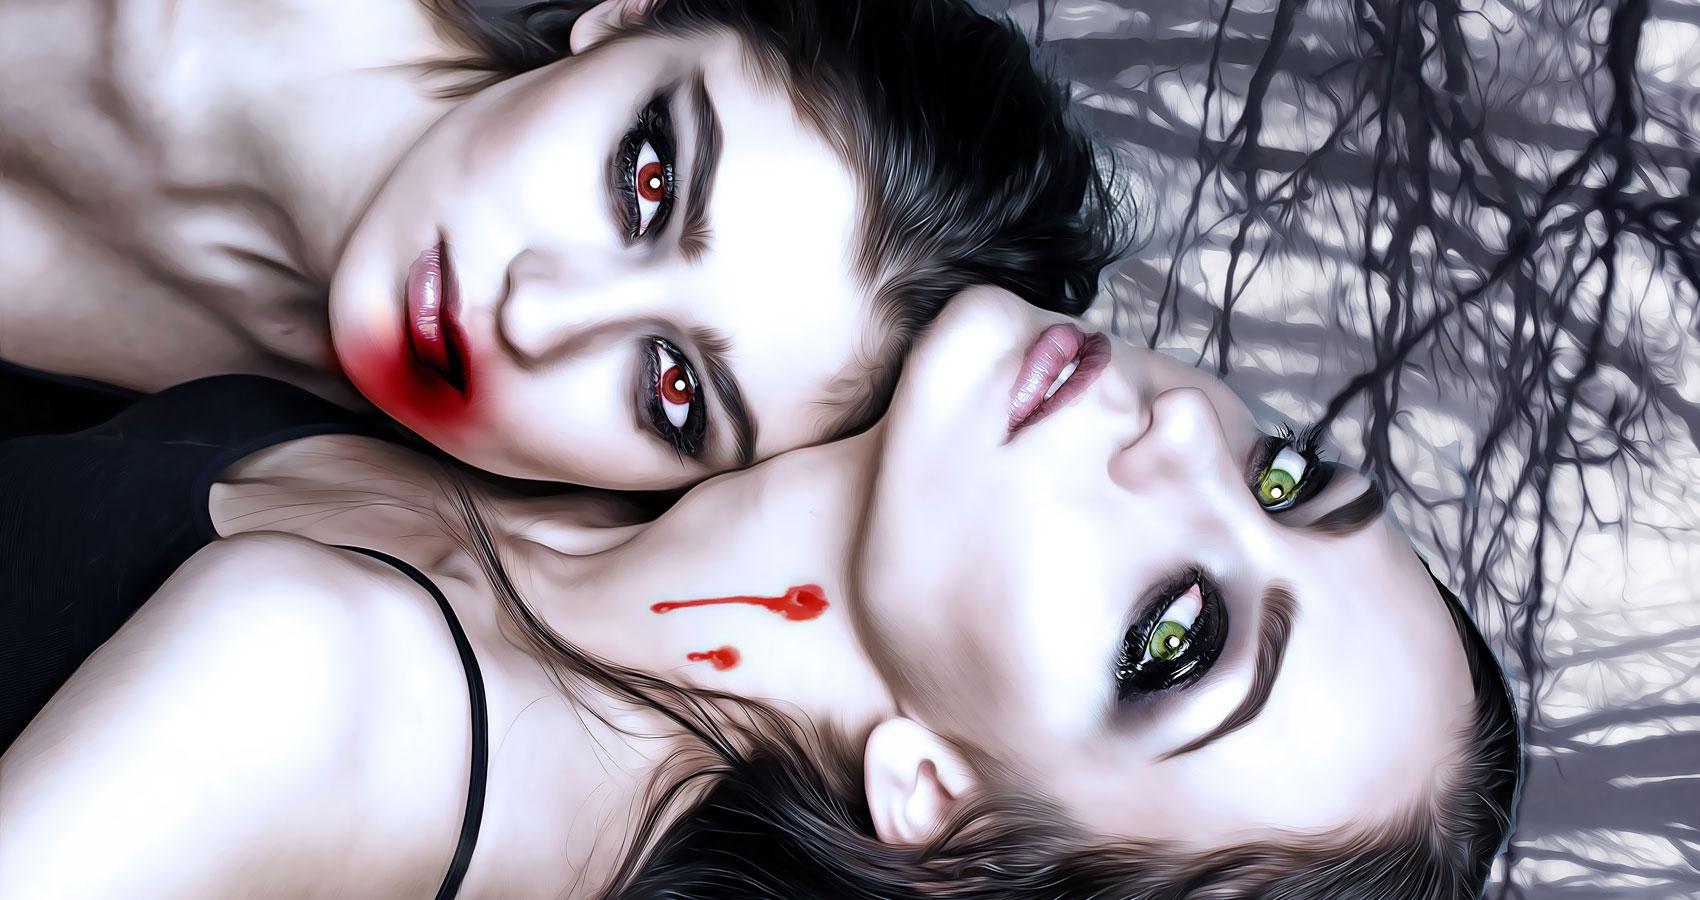 RoseBite written by Sexiest Vampireat Spillwords.com